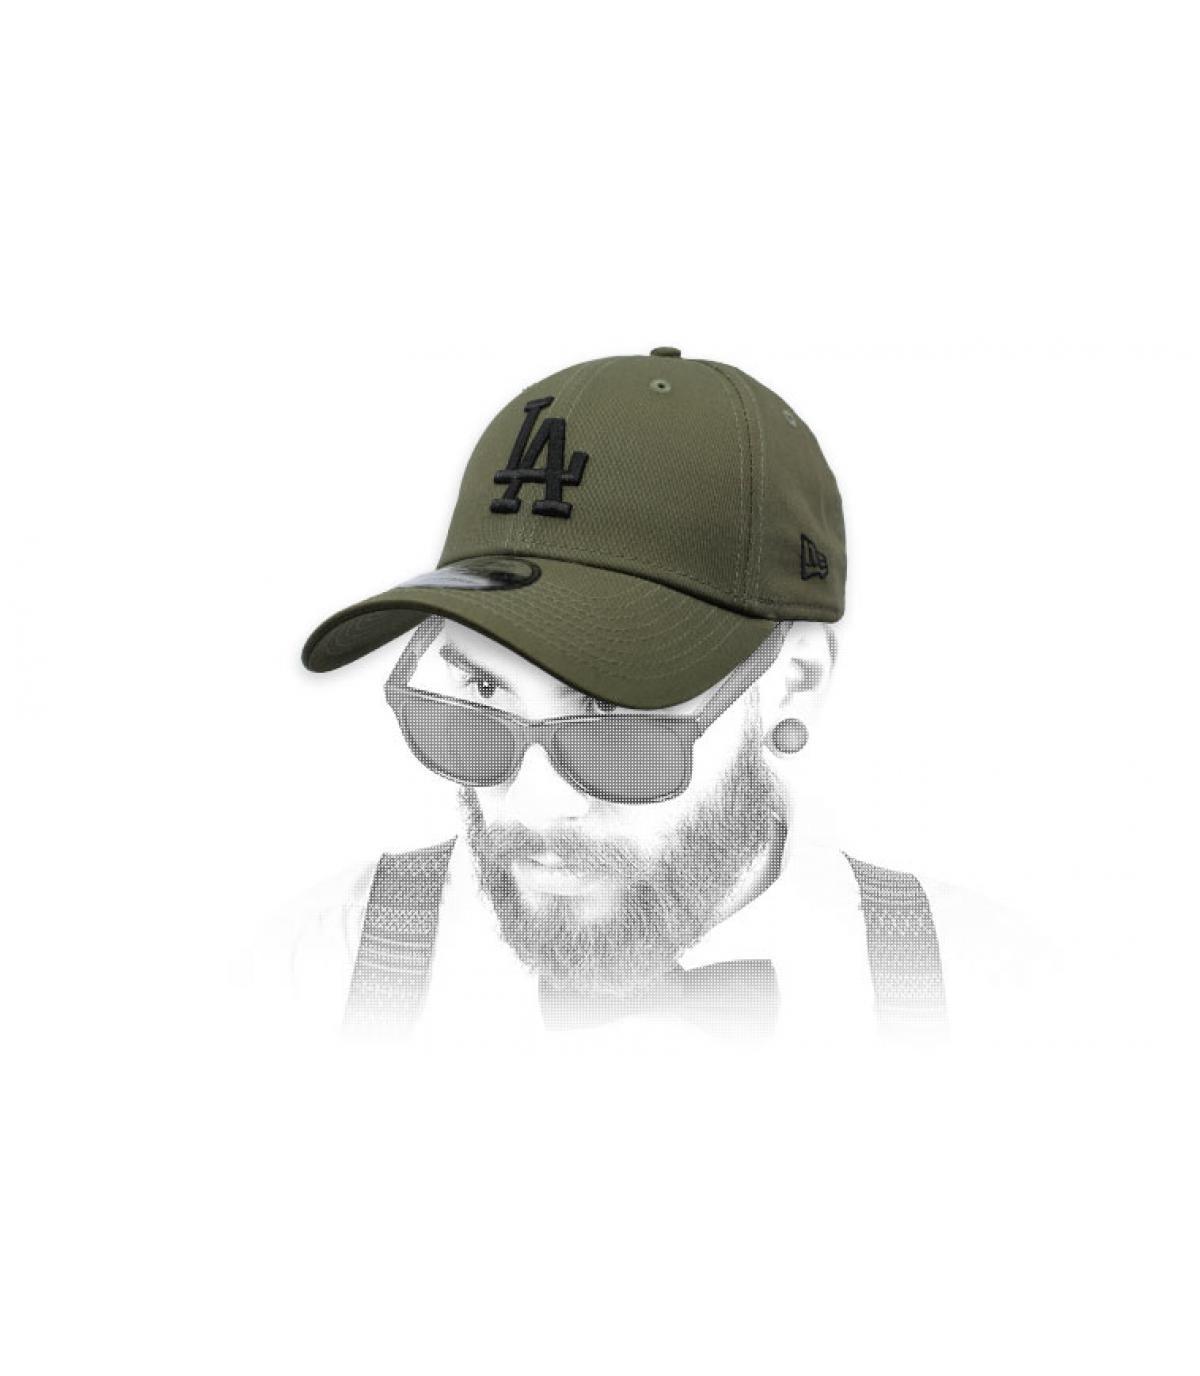 gorra LA verde gris